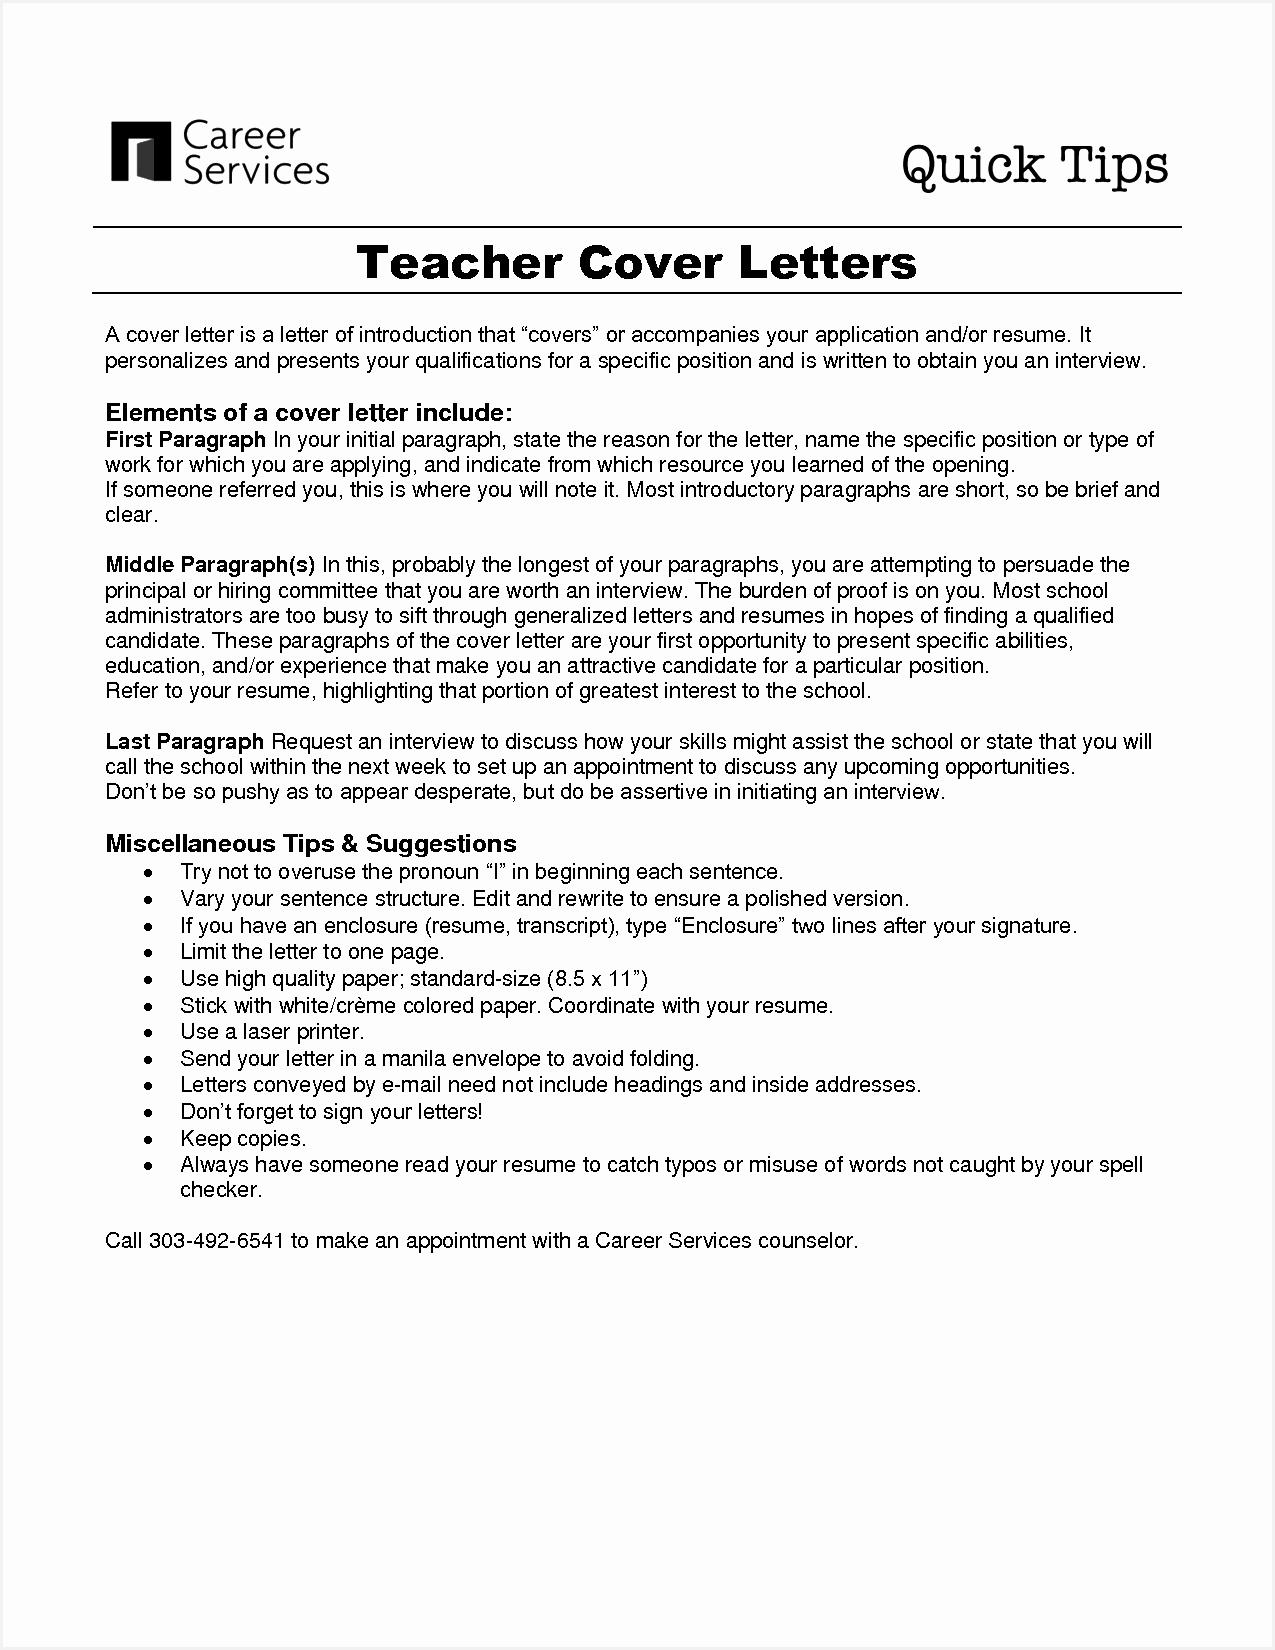 Pharmacist Cv Template New Homework Help Tutor English Part Time Contract University Pharmacist Cv16501275